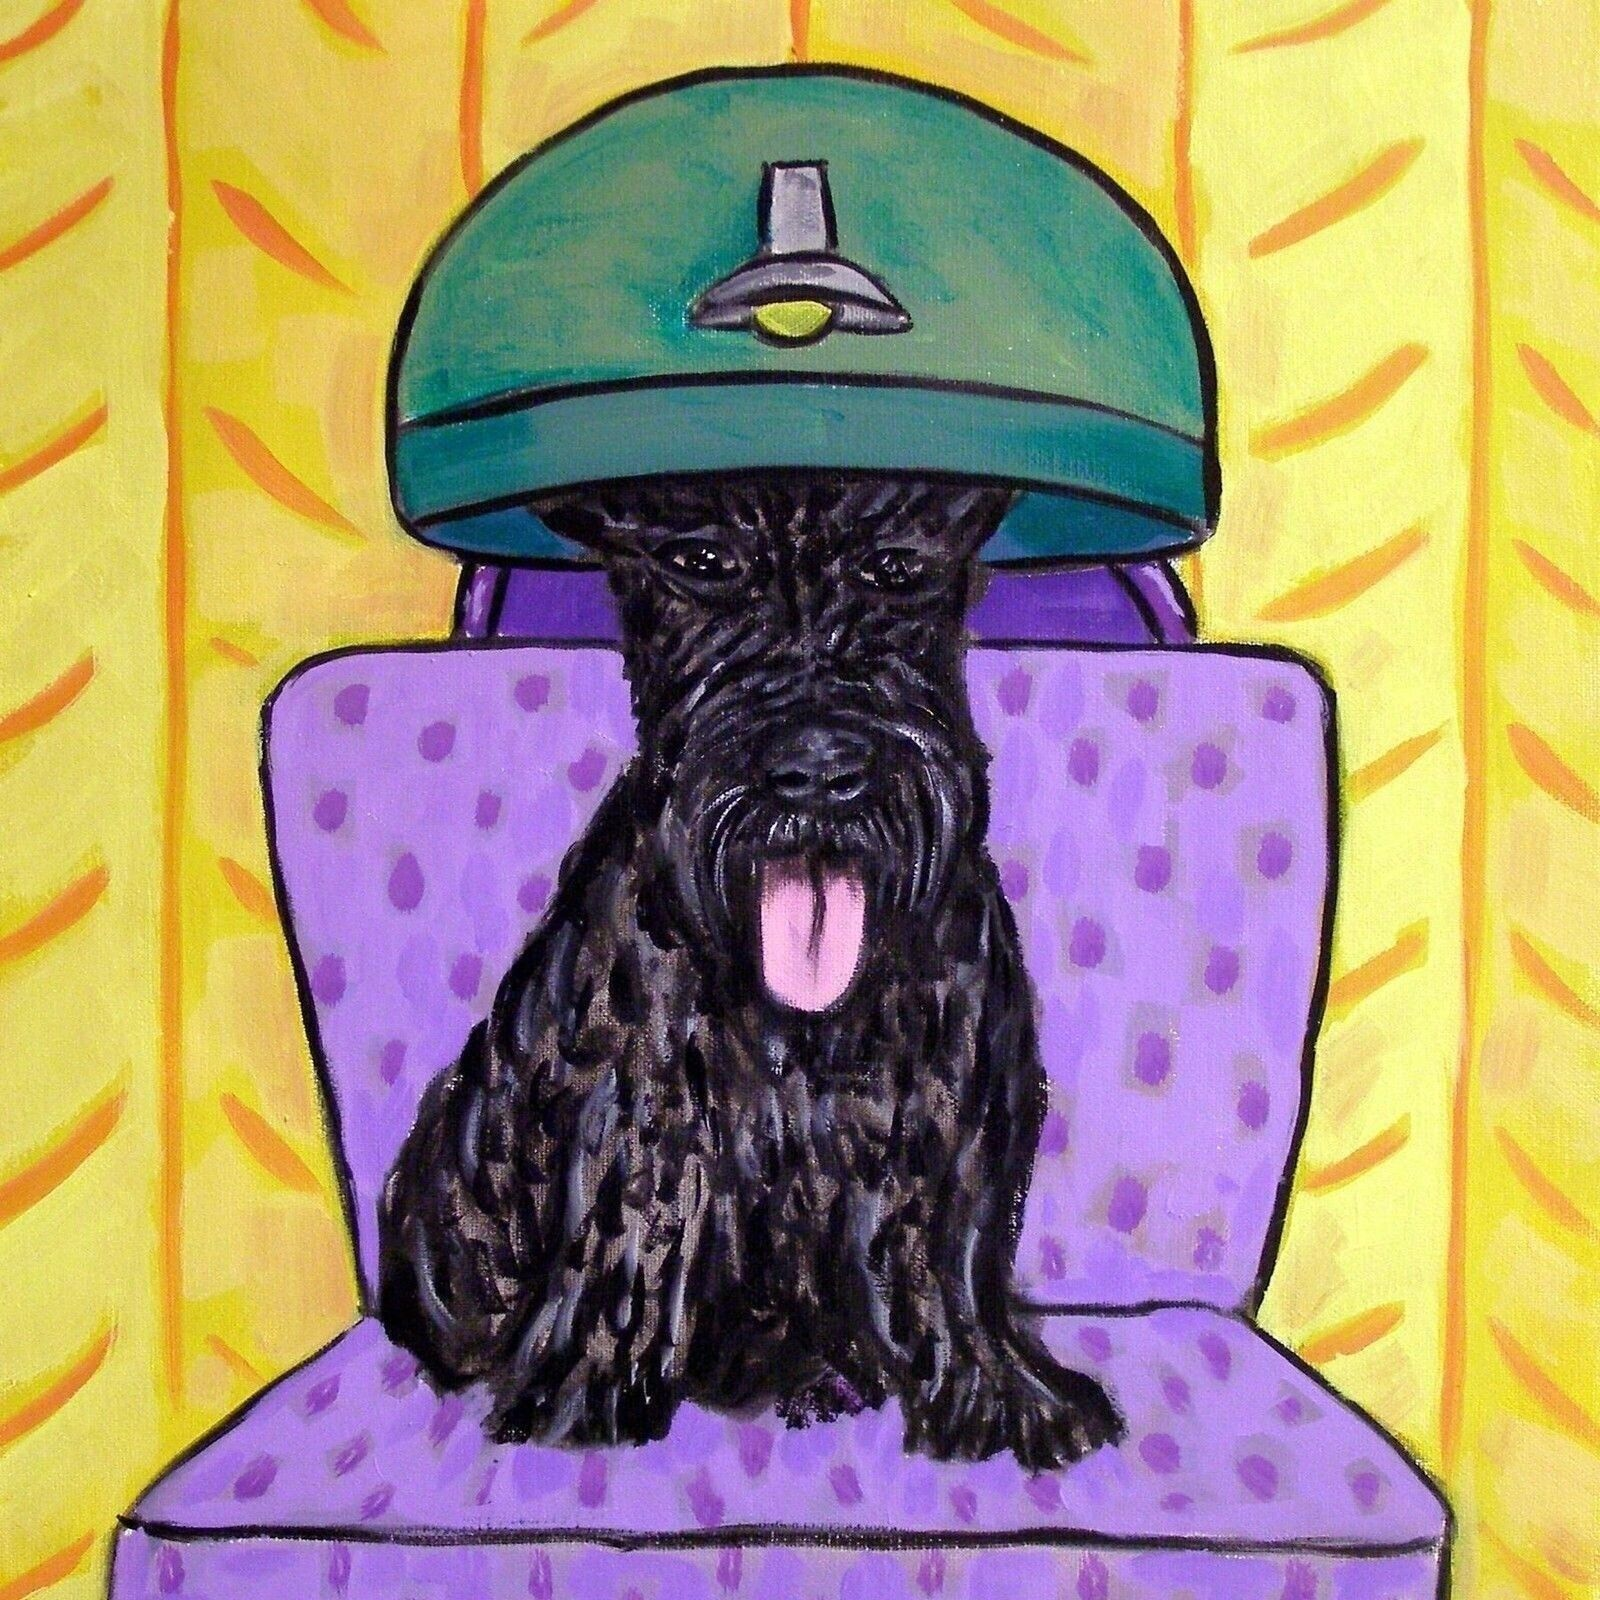 schnauzer dog pet salon wall art 13x19 PRINT  JSCHMETZ